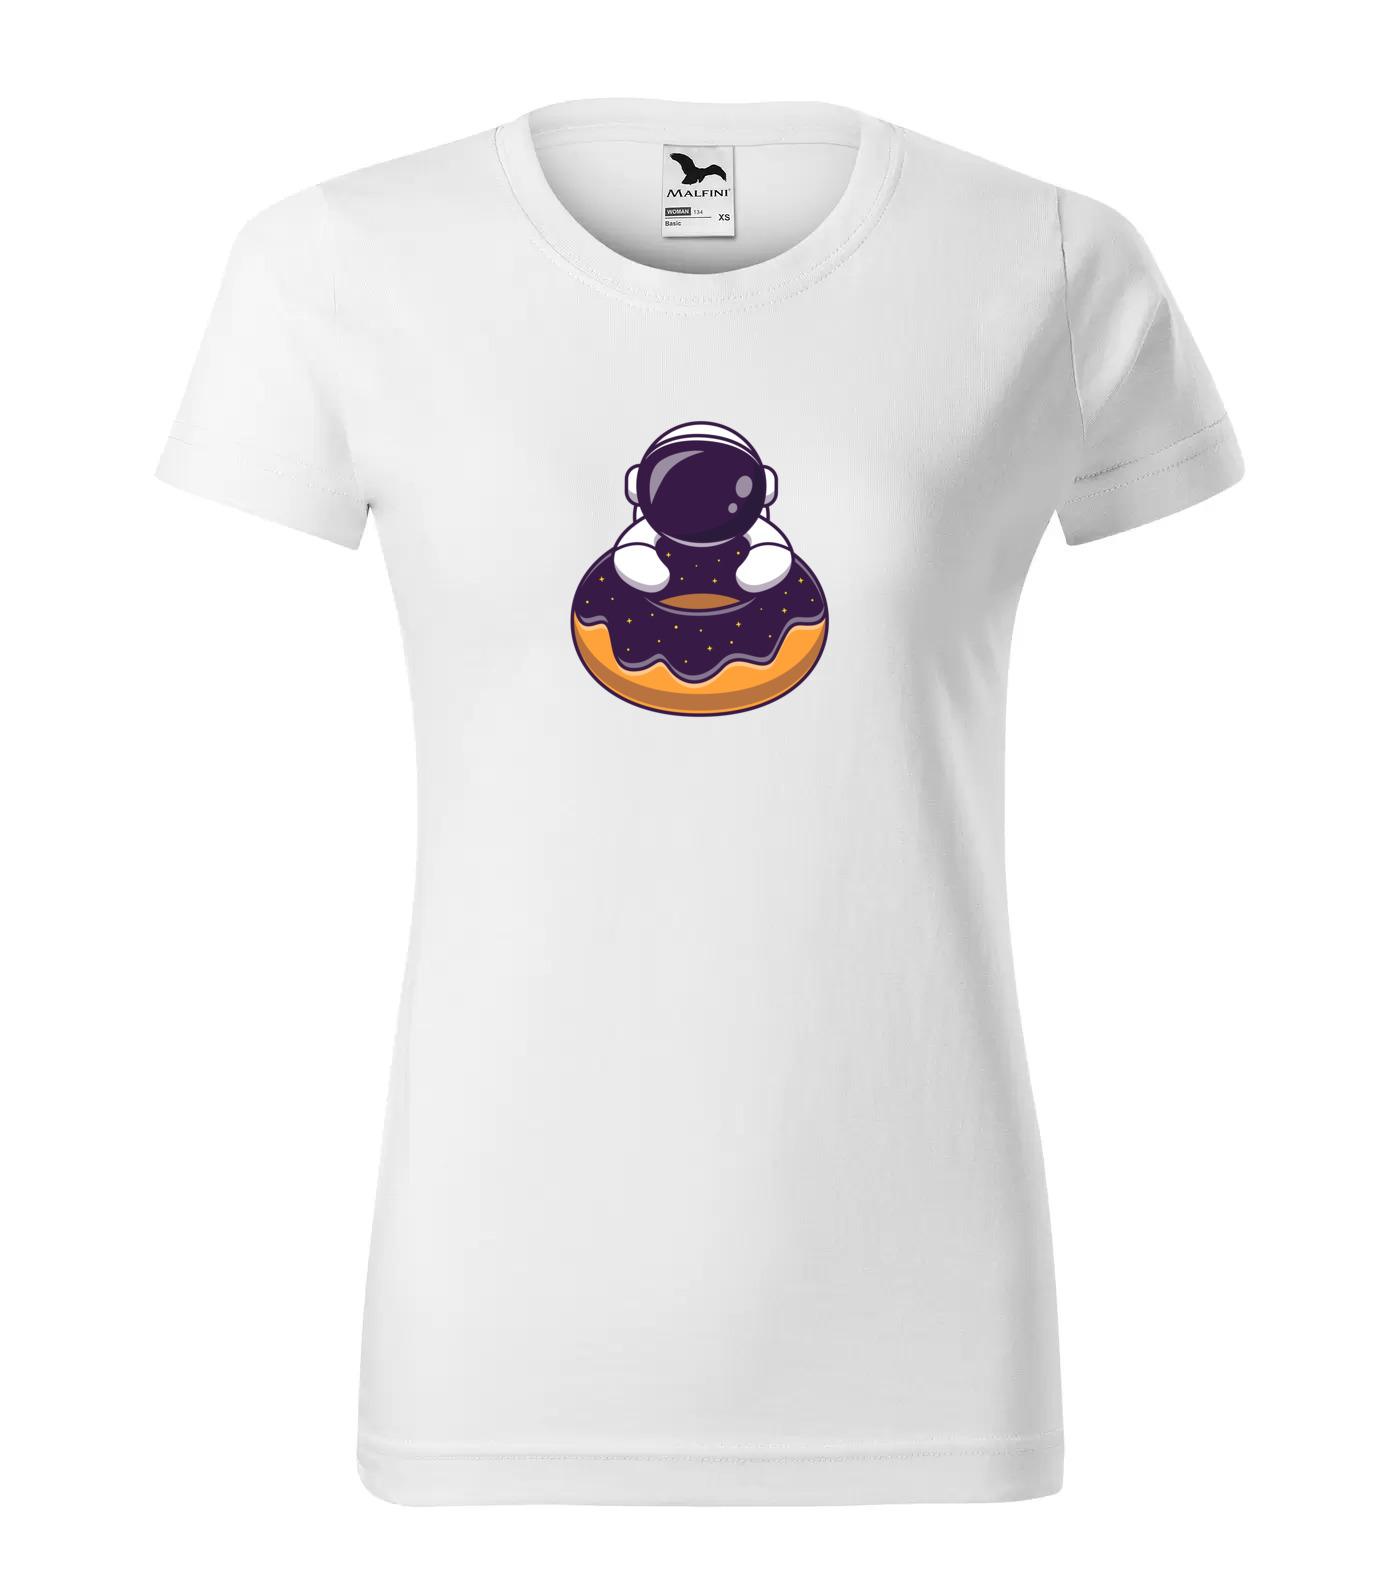 Tričko Astronaut prstenec donut